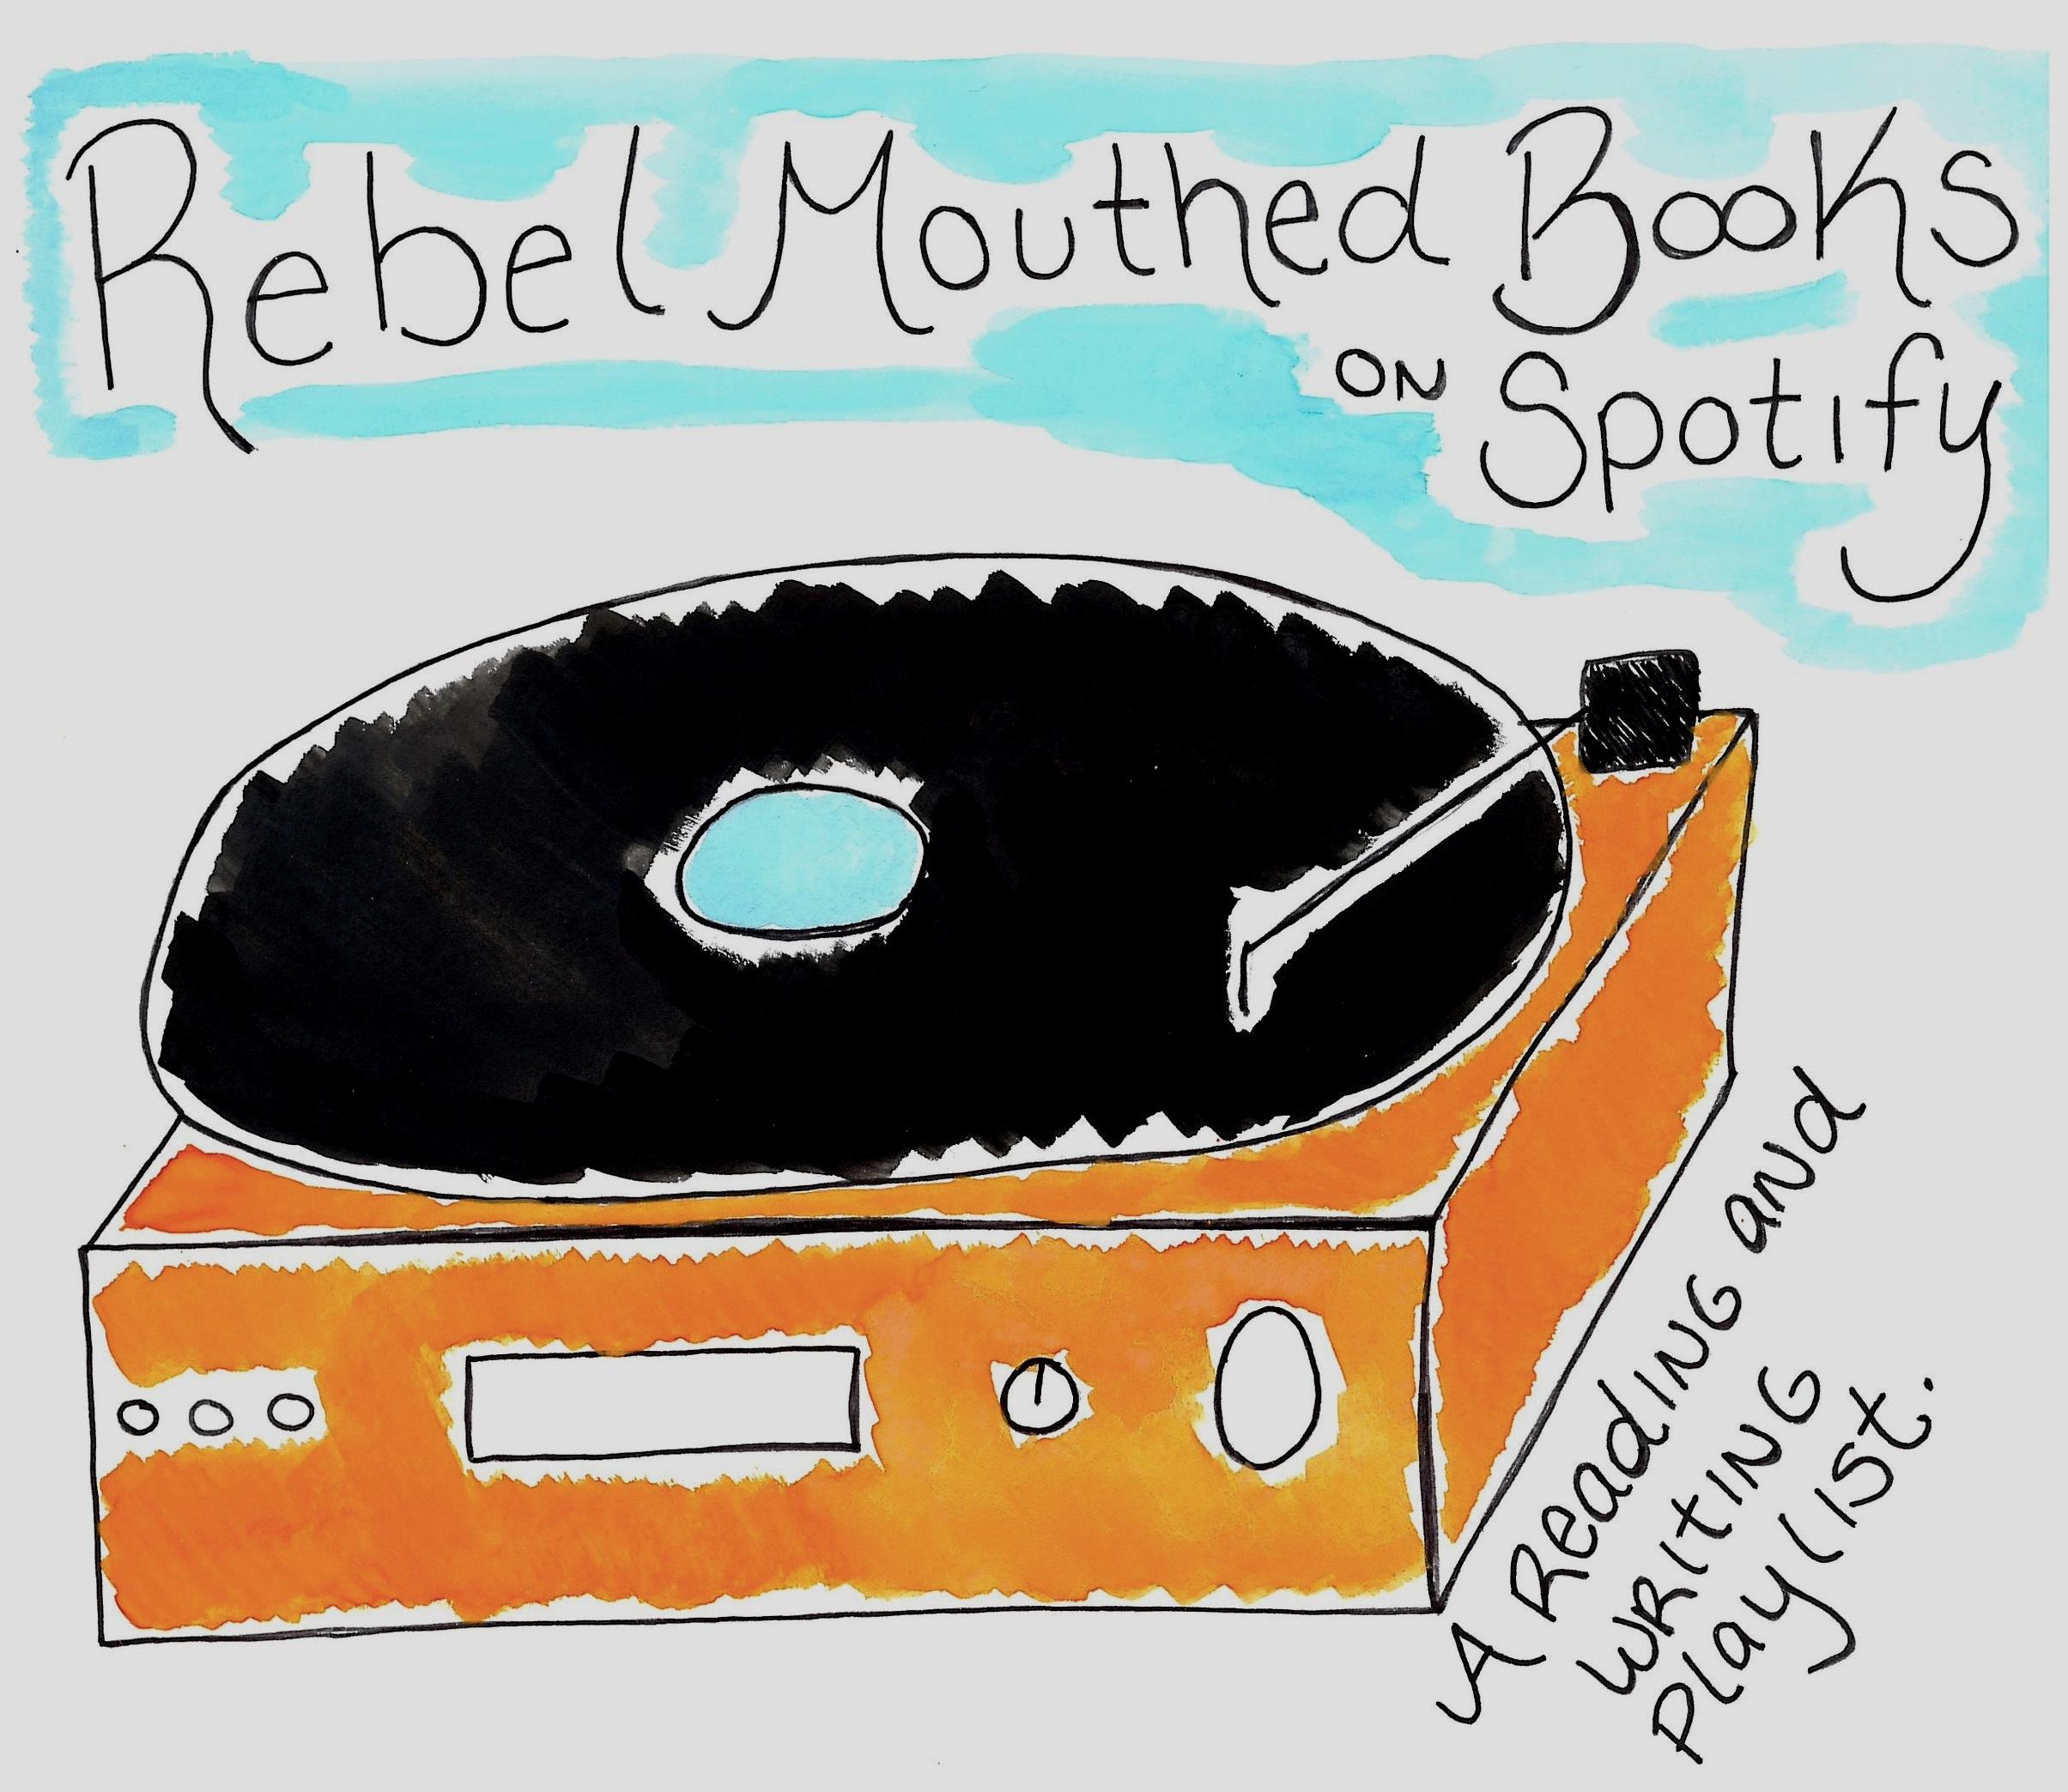 Rebel%2BMouthed%2BBooks%2Bon%2BSpotify.jpg